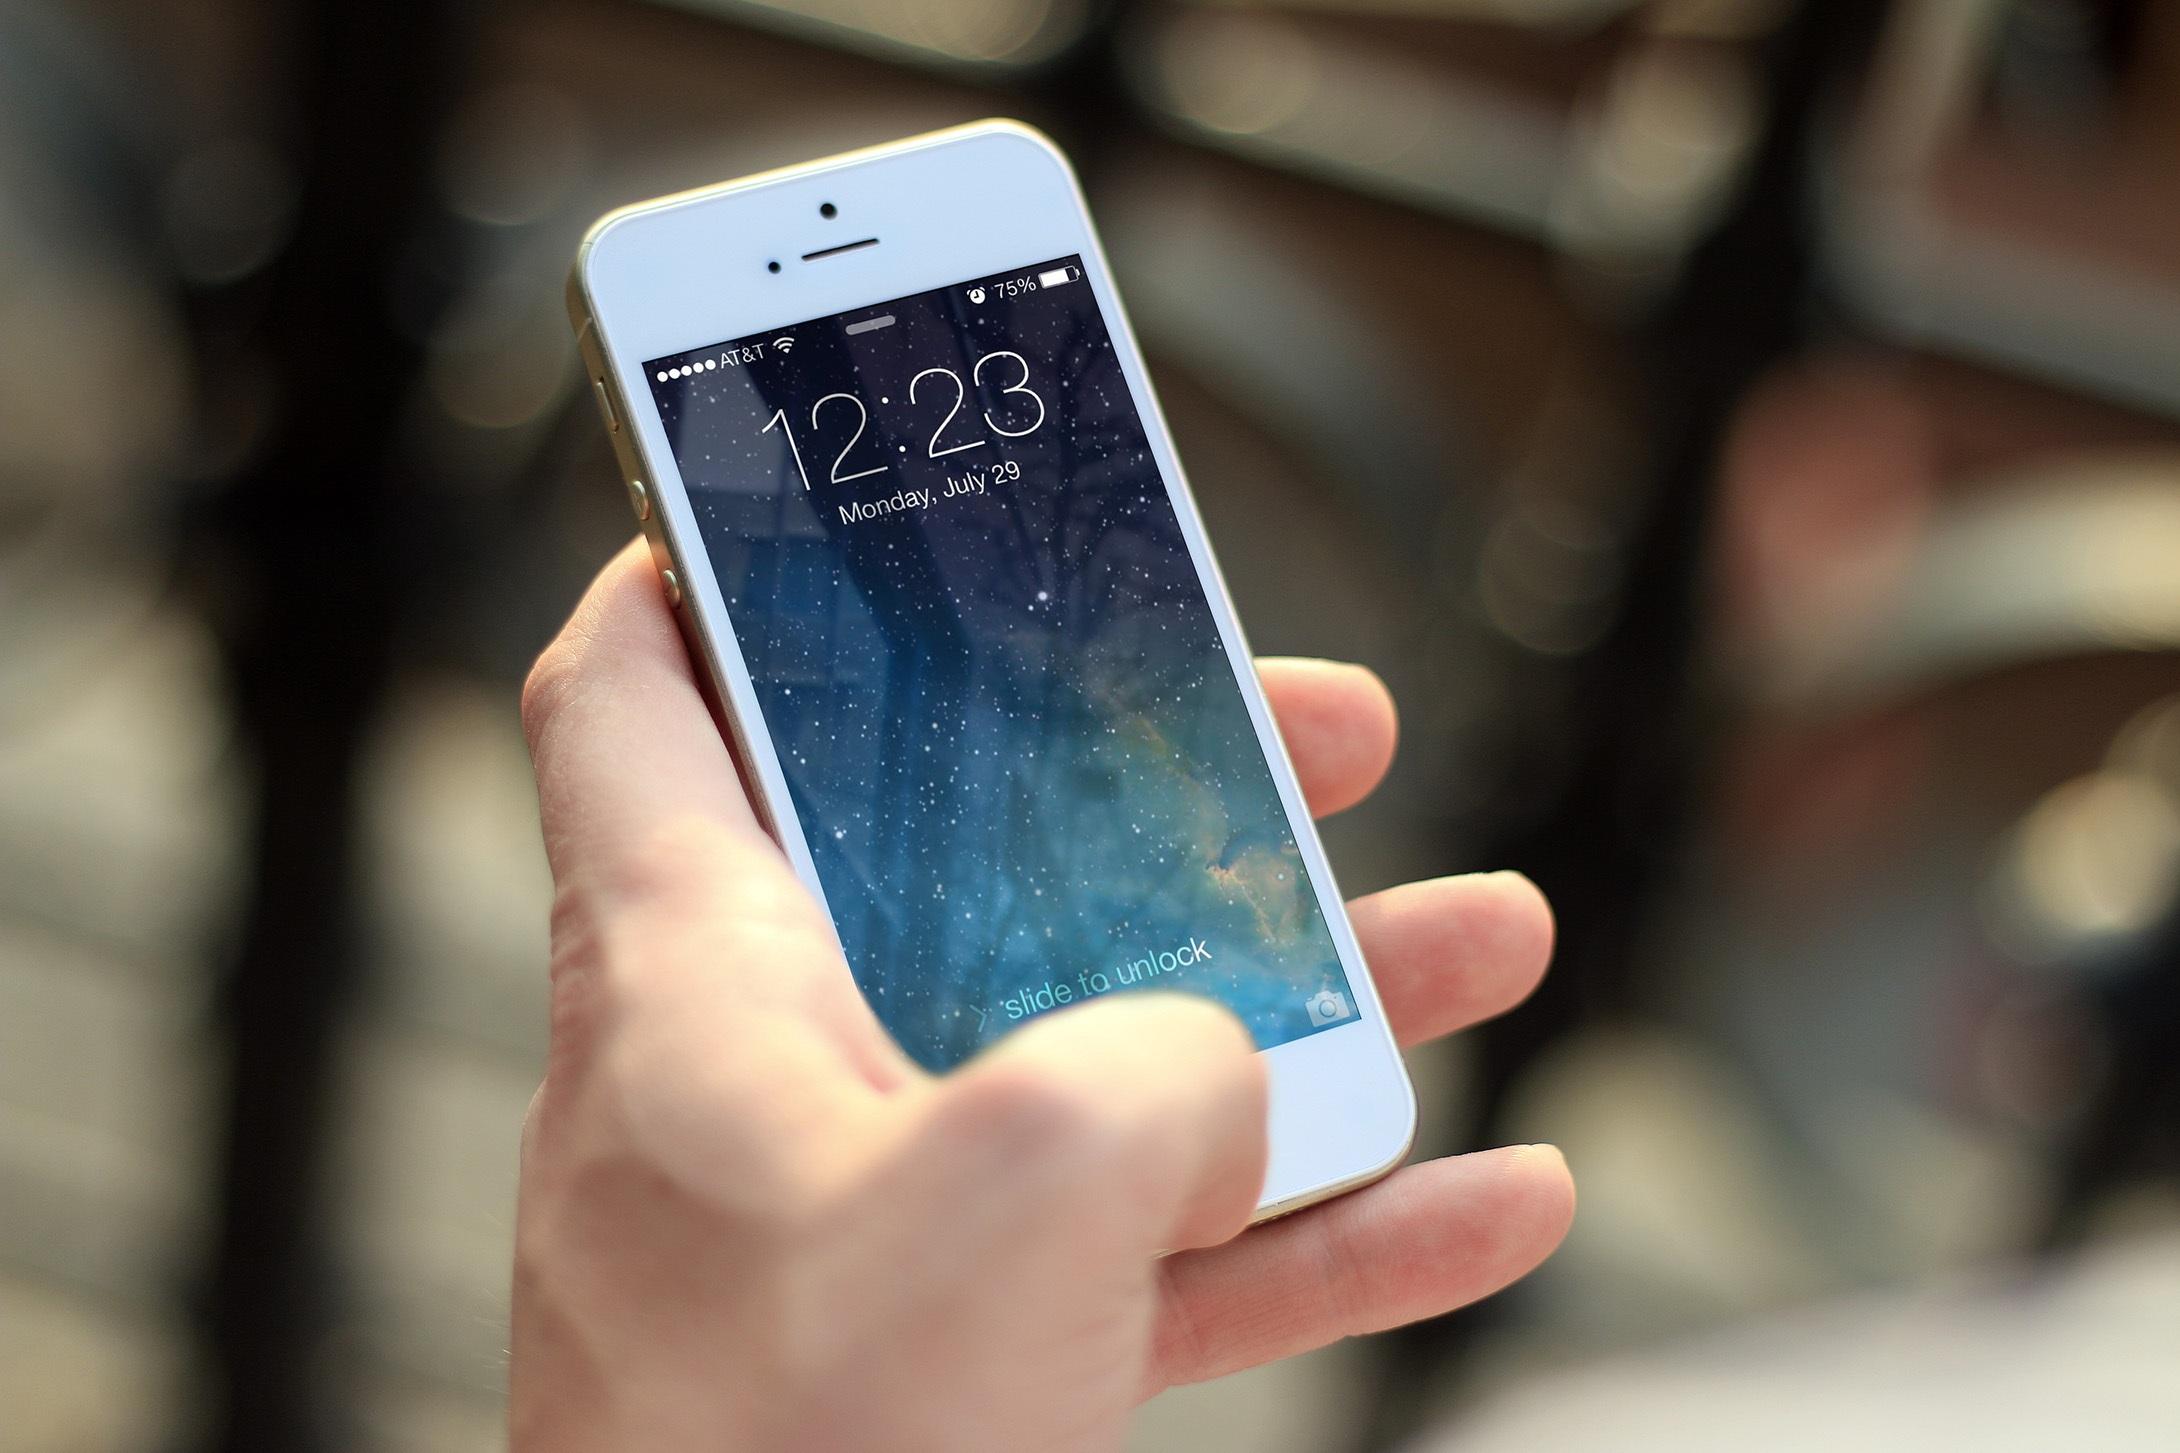 iphone-smartphone-apps-apple-inc-40011-1.jpeg